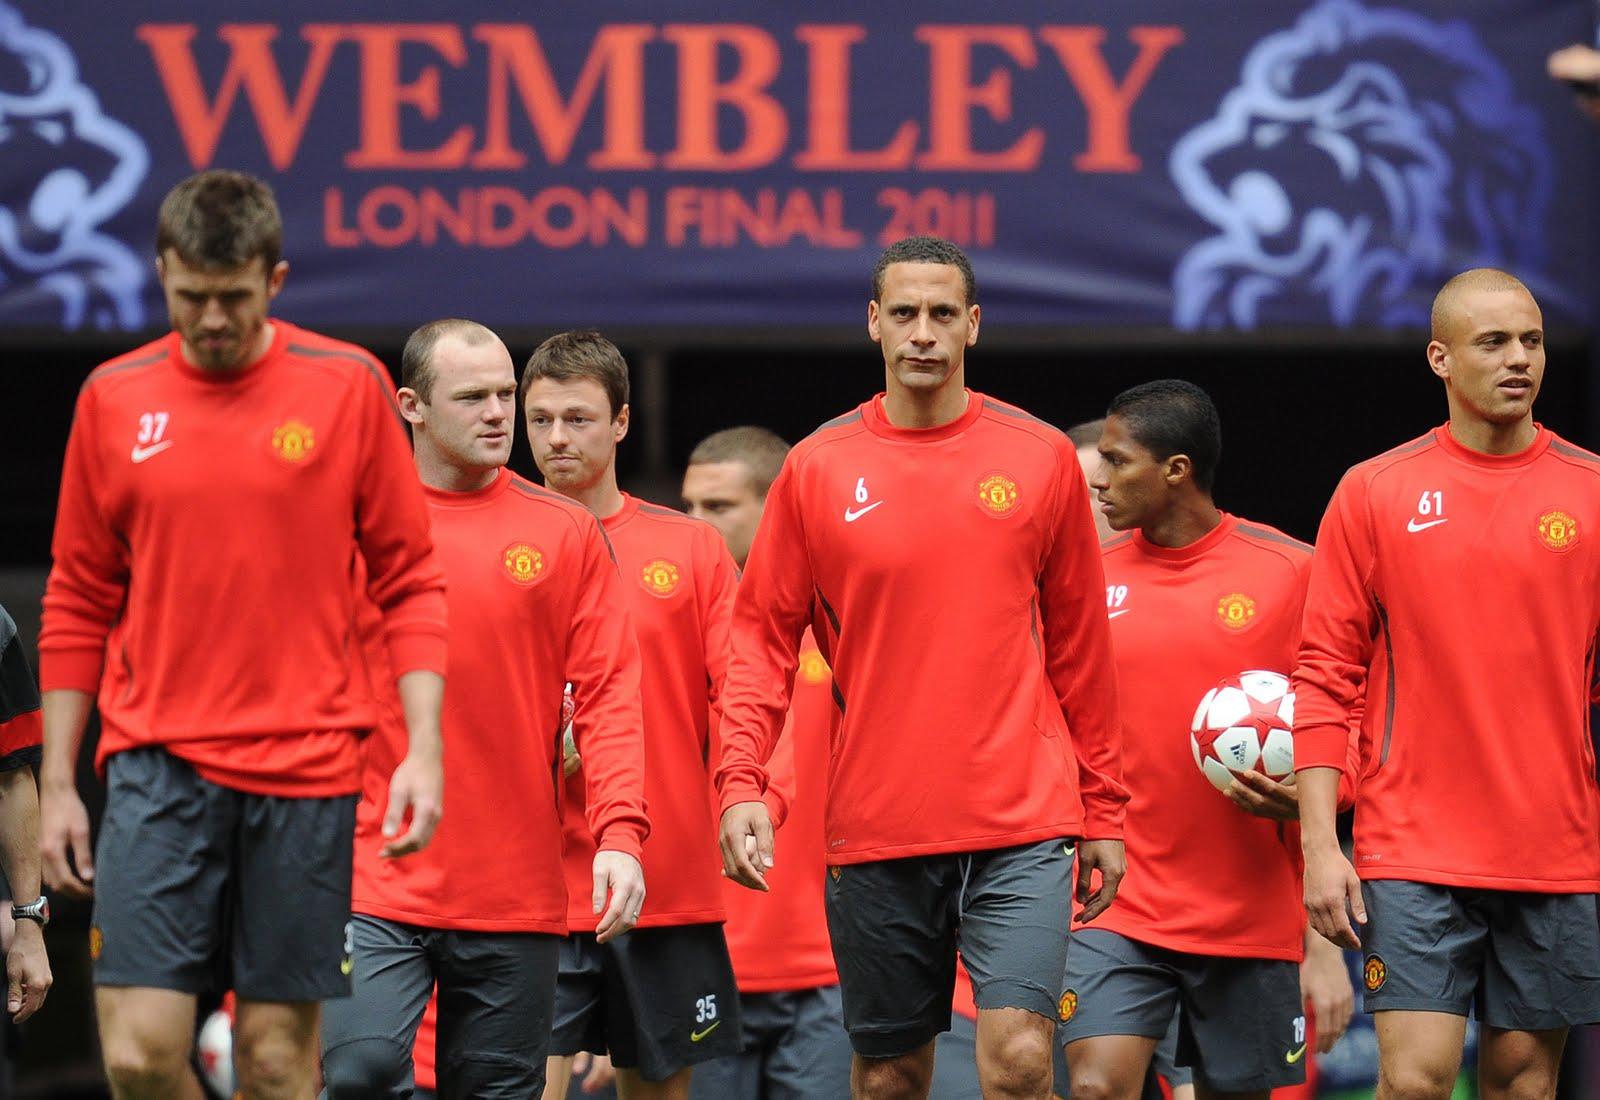 http://2.bp.blogspot.com/-k8ABNwafwBM/TeBISvmrpvI/AAAAAAAAFQI/rGOr8OKuwHk/s1600/Man+Utd+At+Wembley.jpg